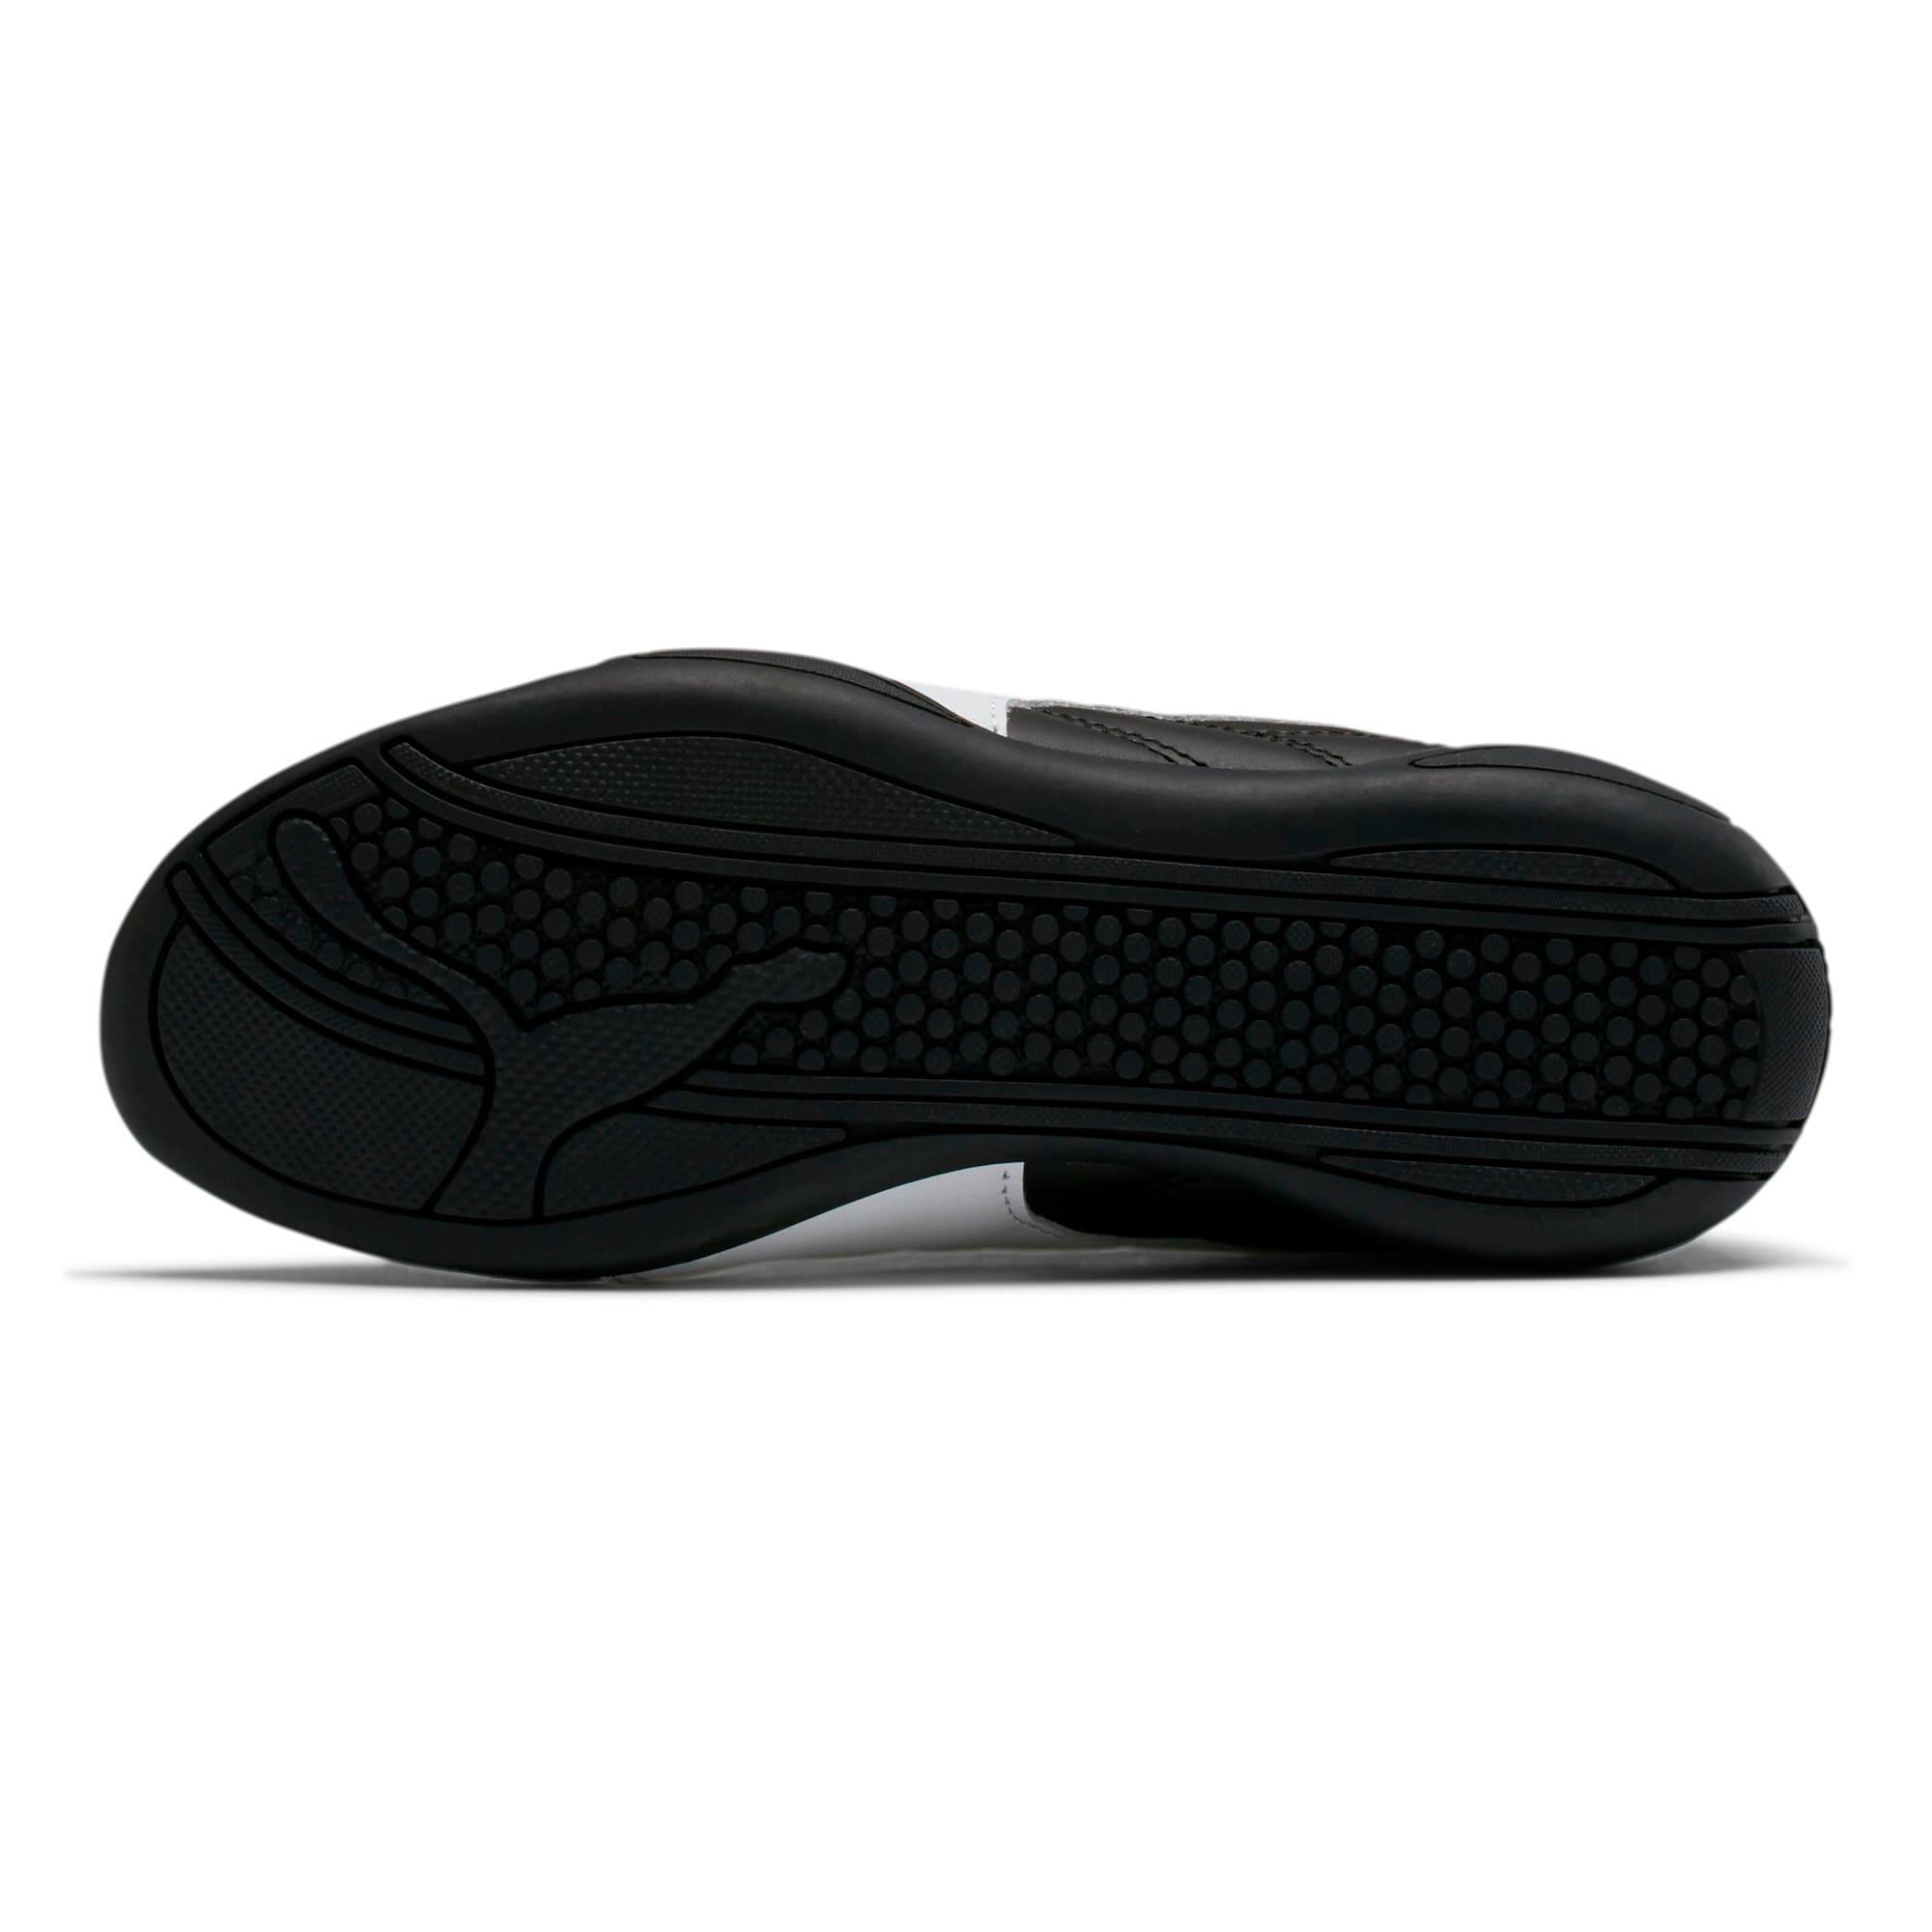 Miniatura 3 de ZapatosTune Cat 3para junior, Puma Black-Puma White, mediano